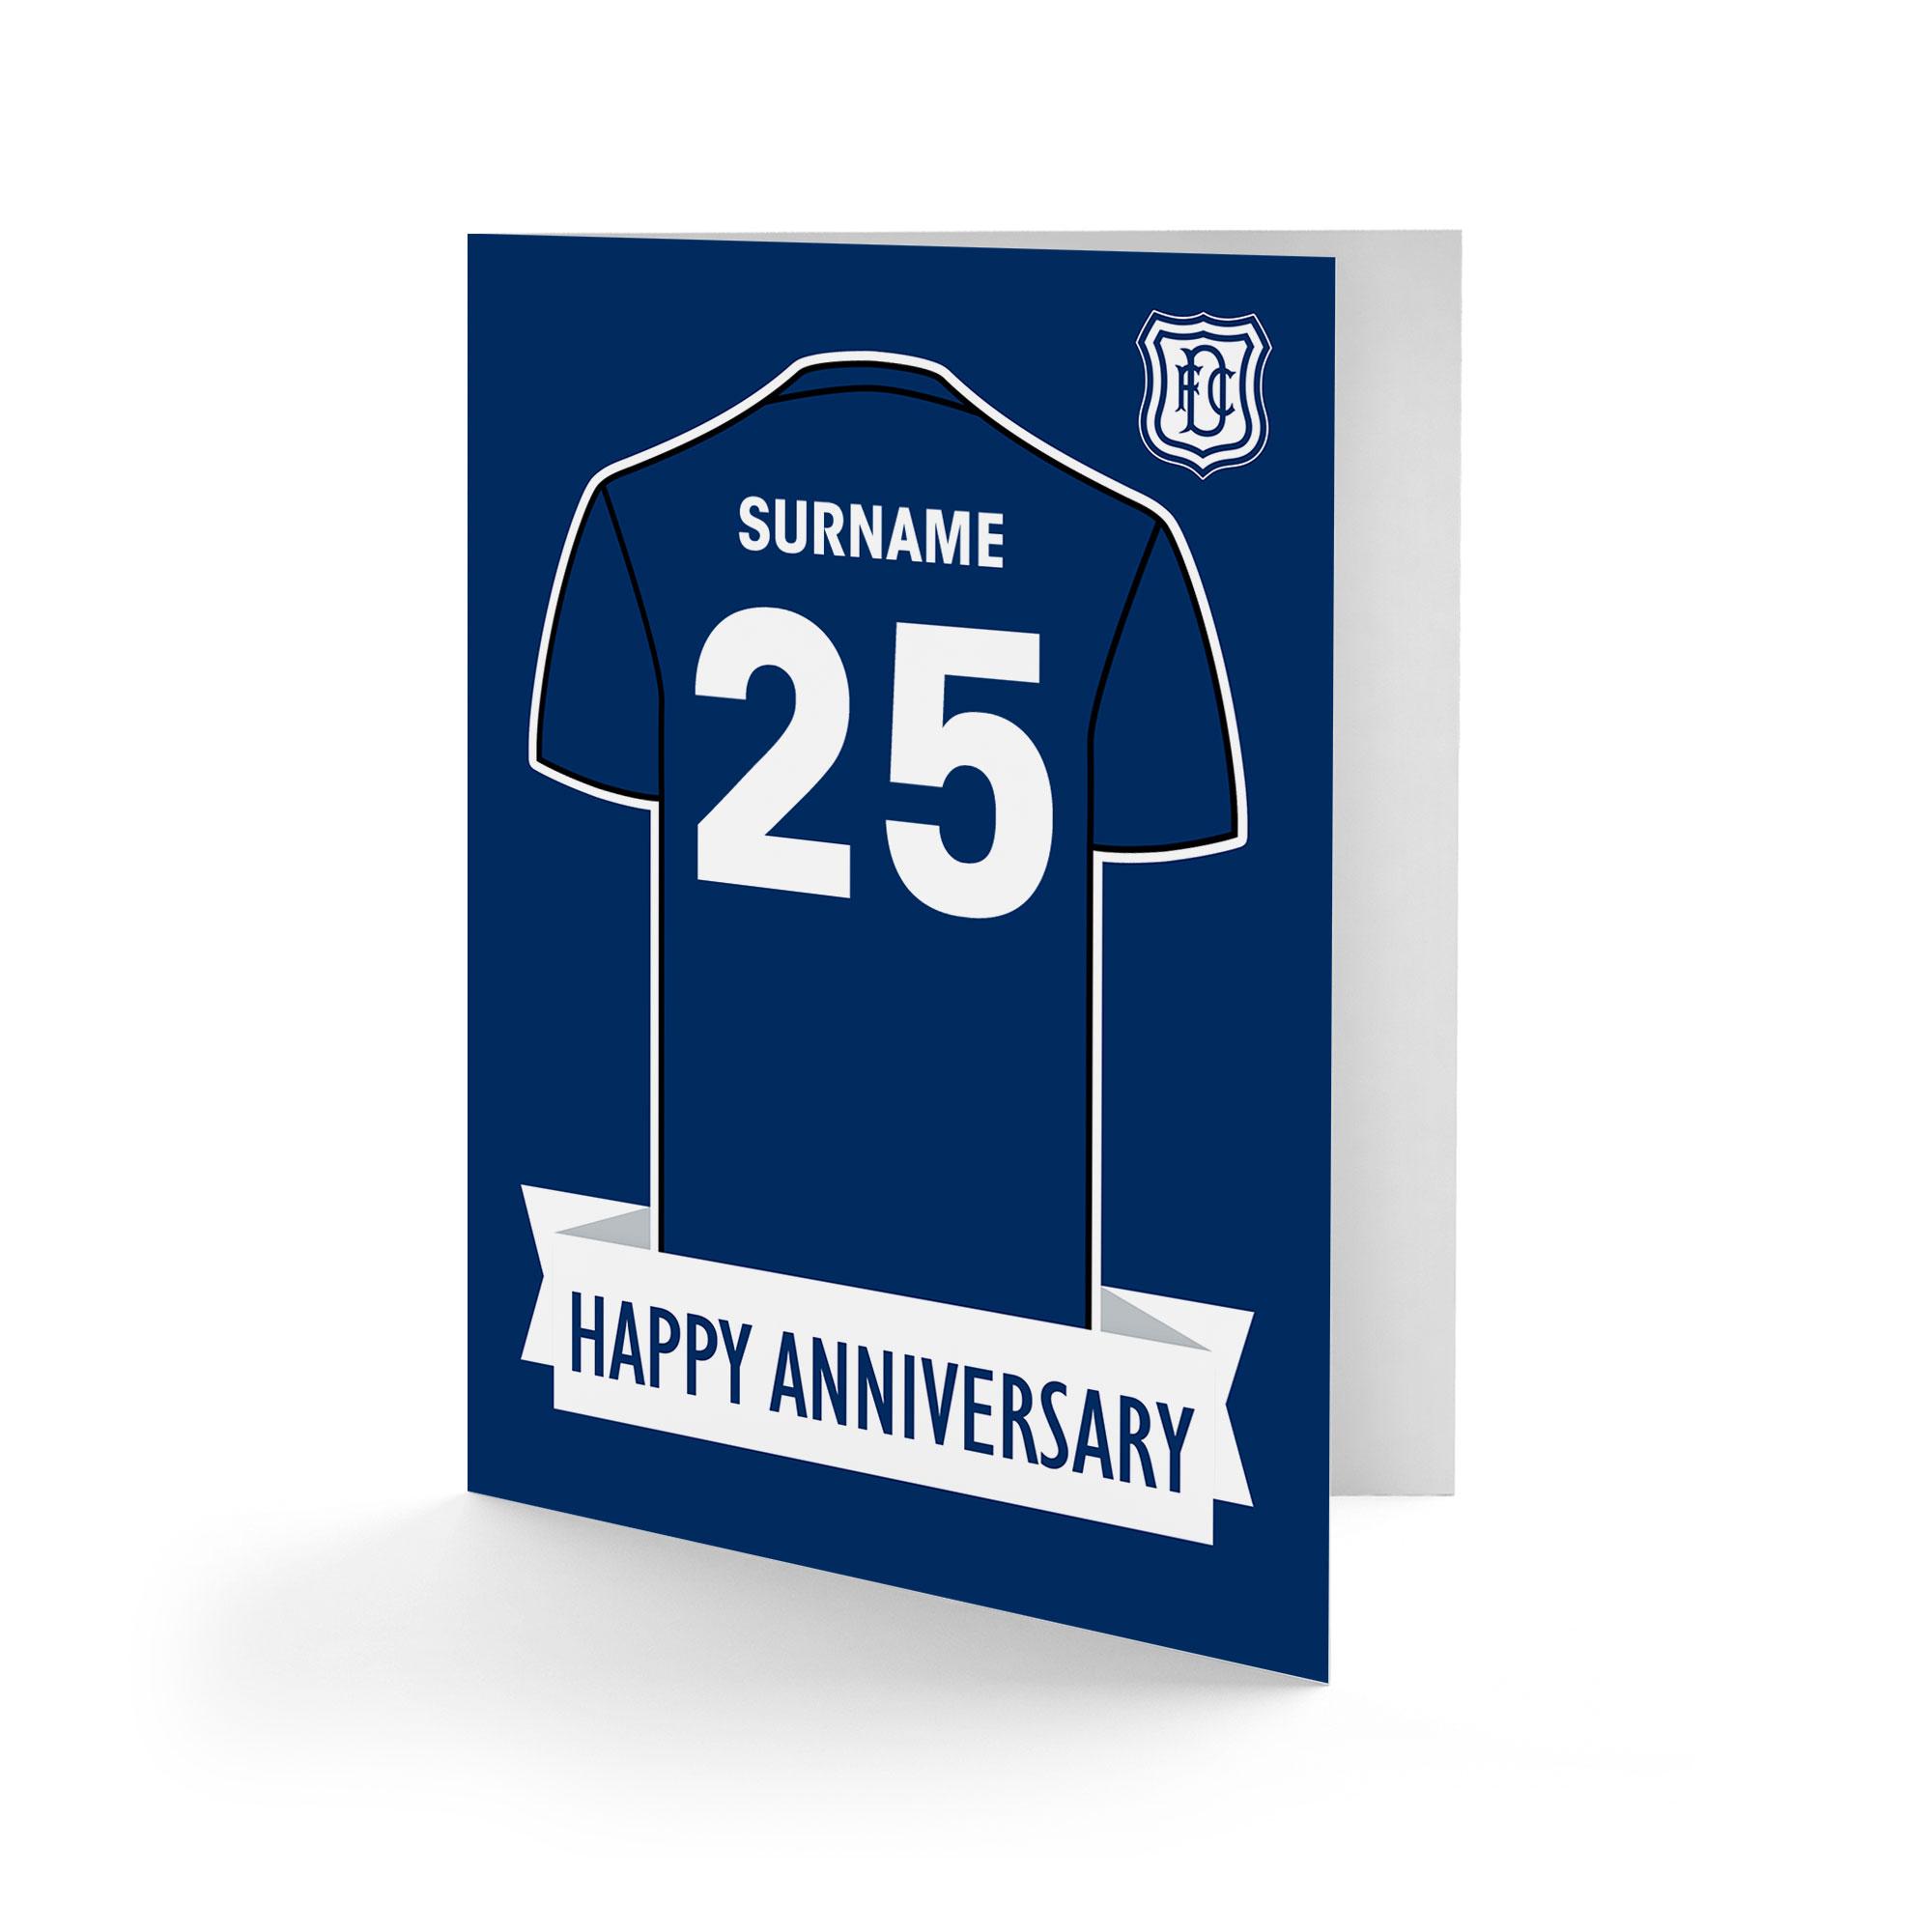 Dundee FC Shirt Anniversary Card